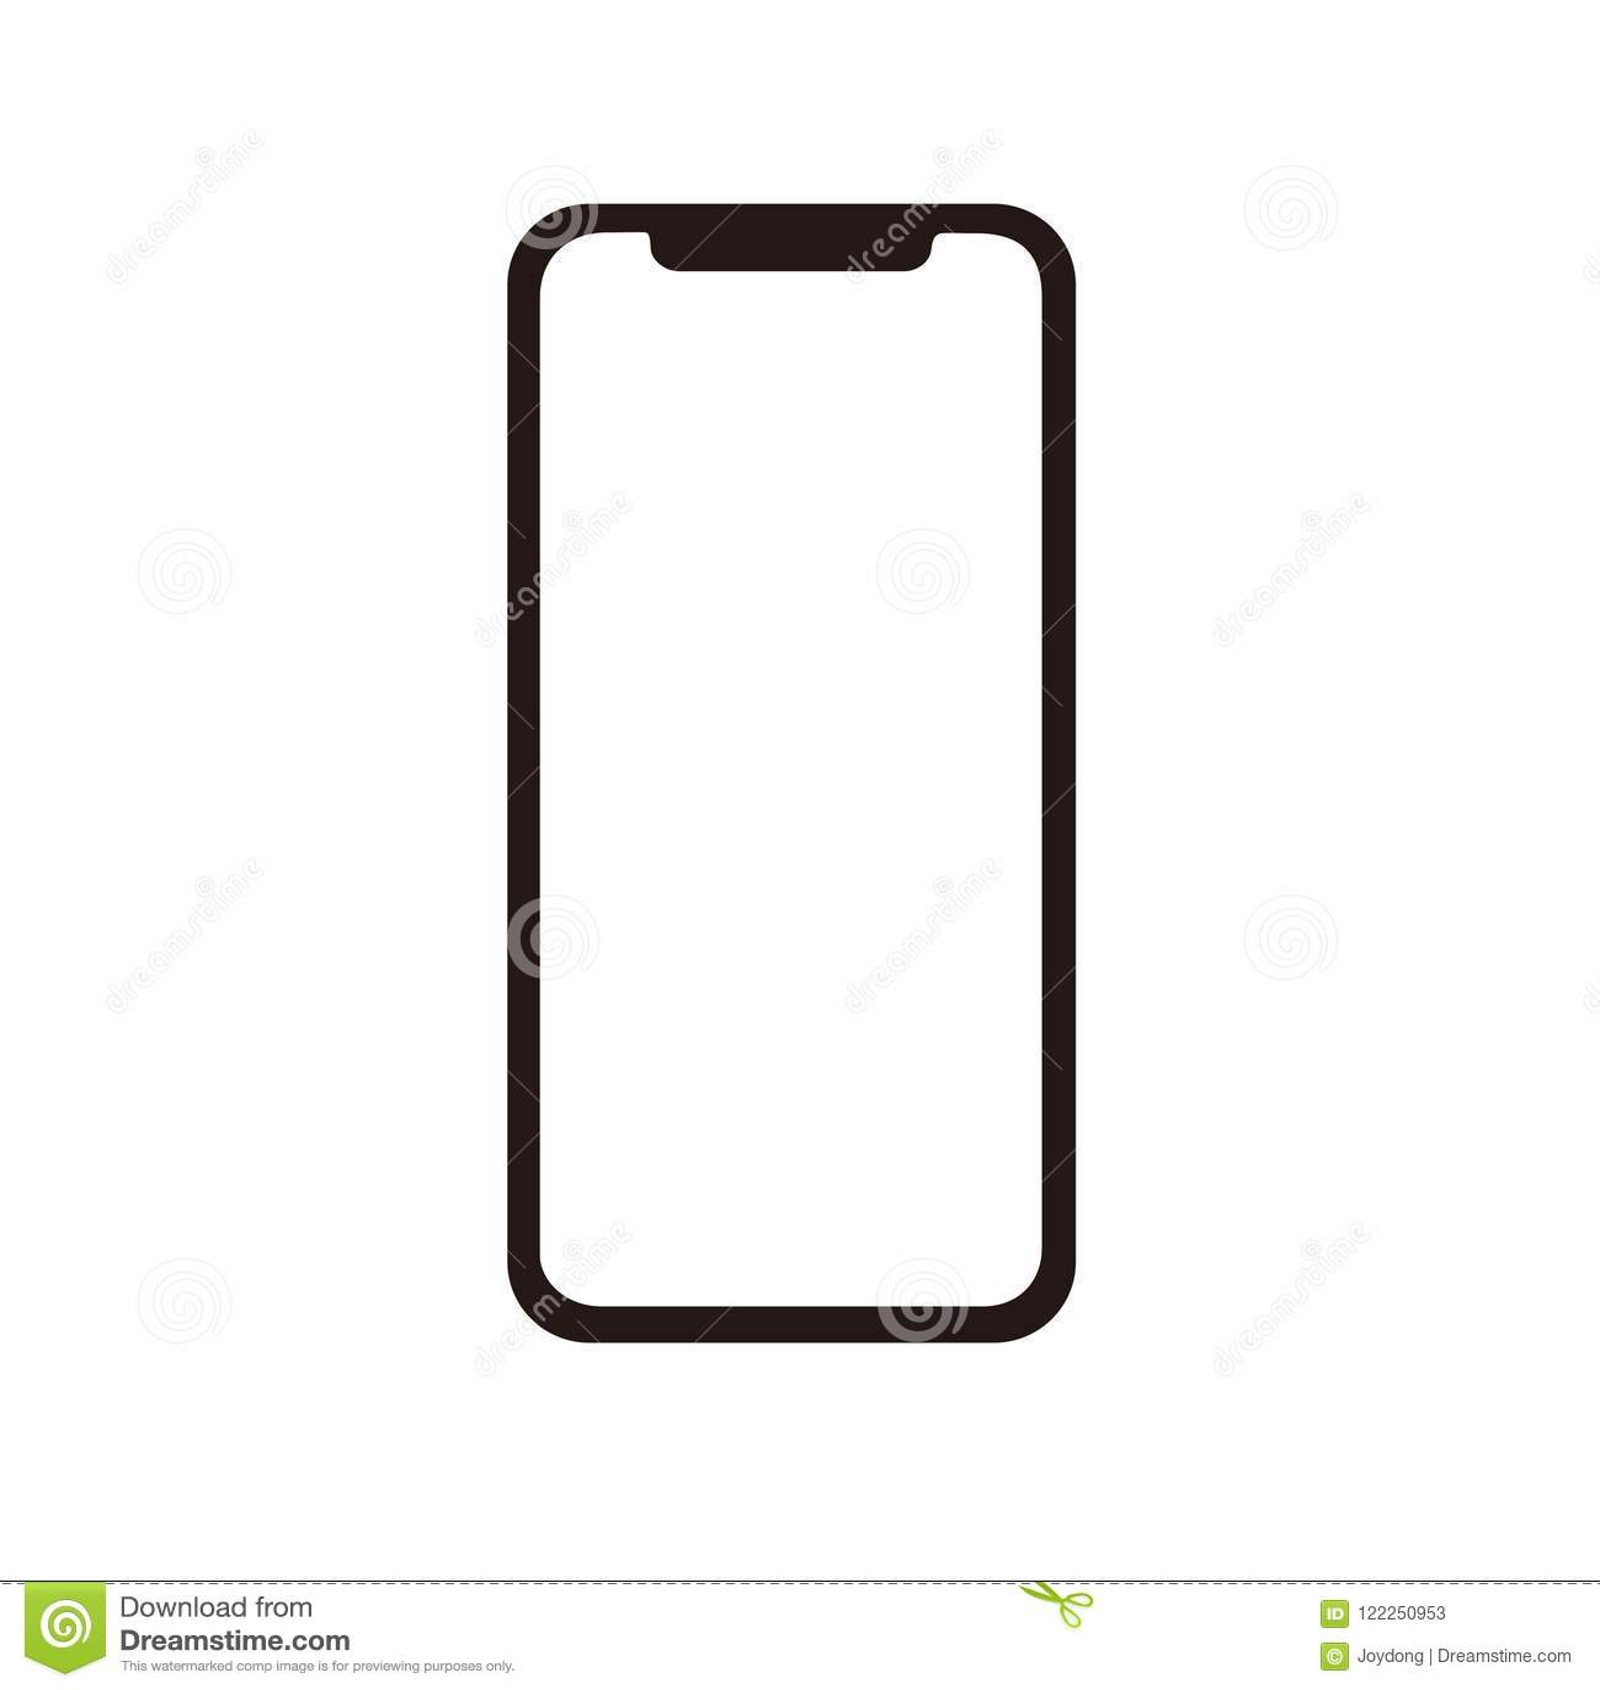 Iphone Χ εικονίδιο για το διάνυσμα